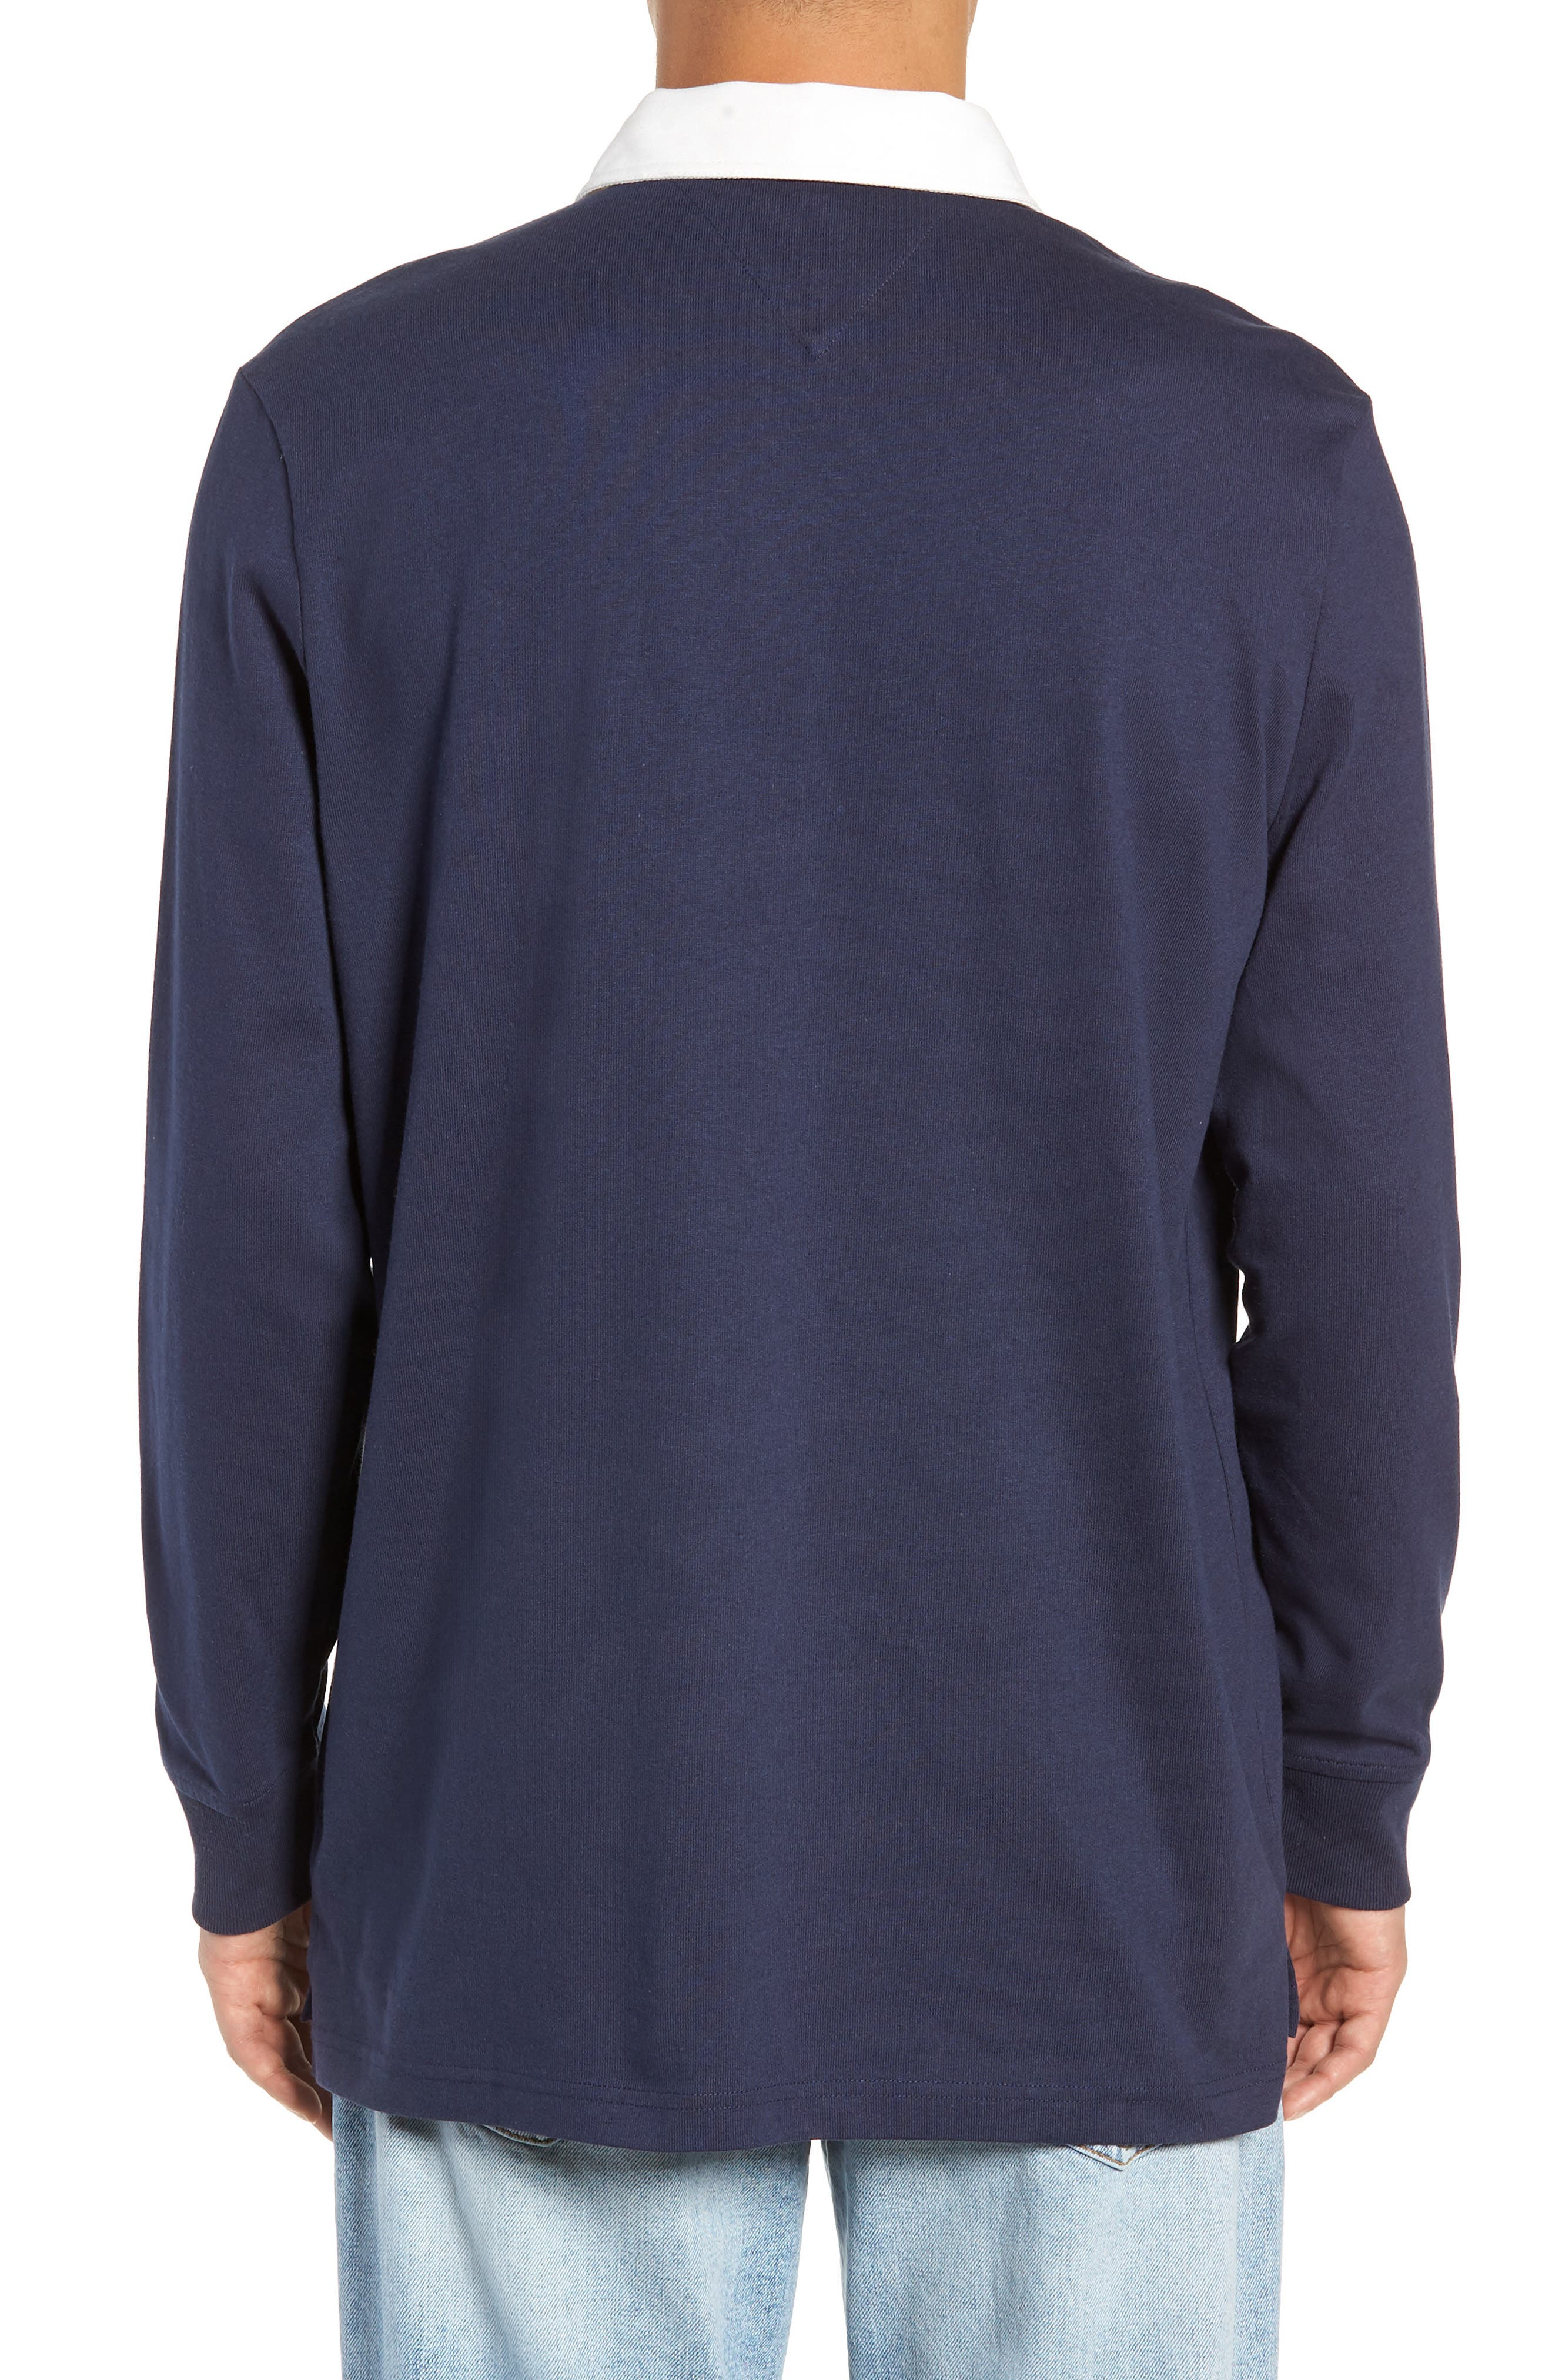 TJM Essential Rugby Shirt,                             Alternate thumbnail 2, color,                             BLACK IRIS